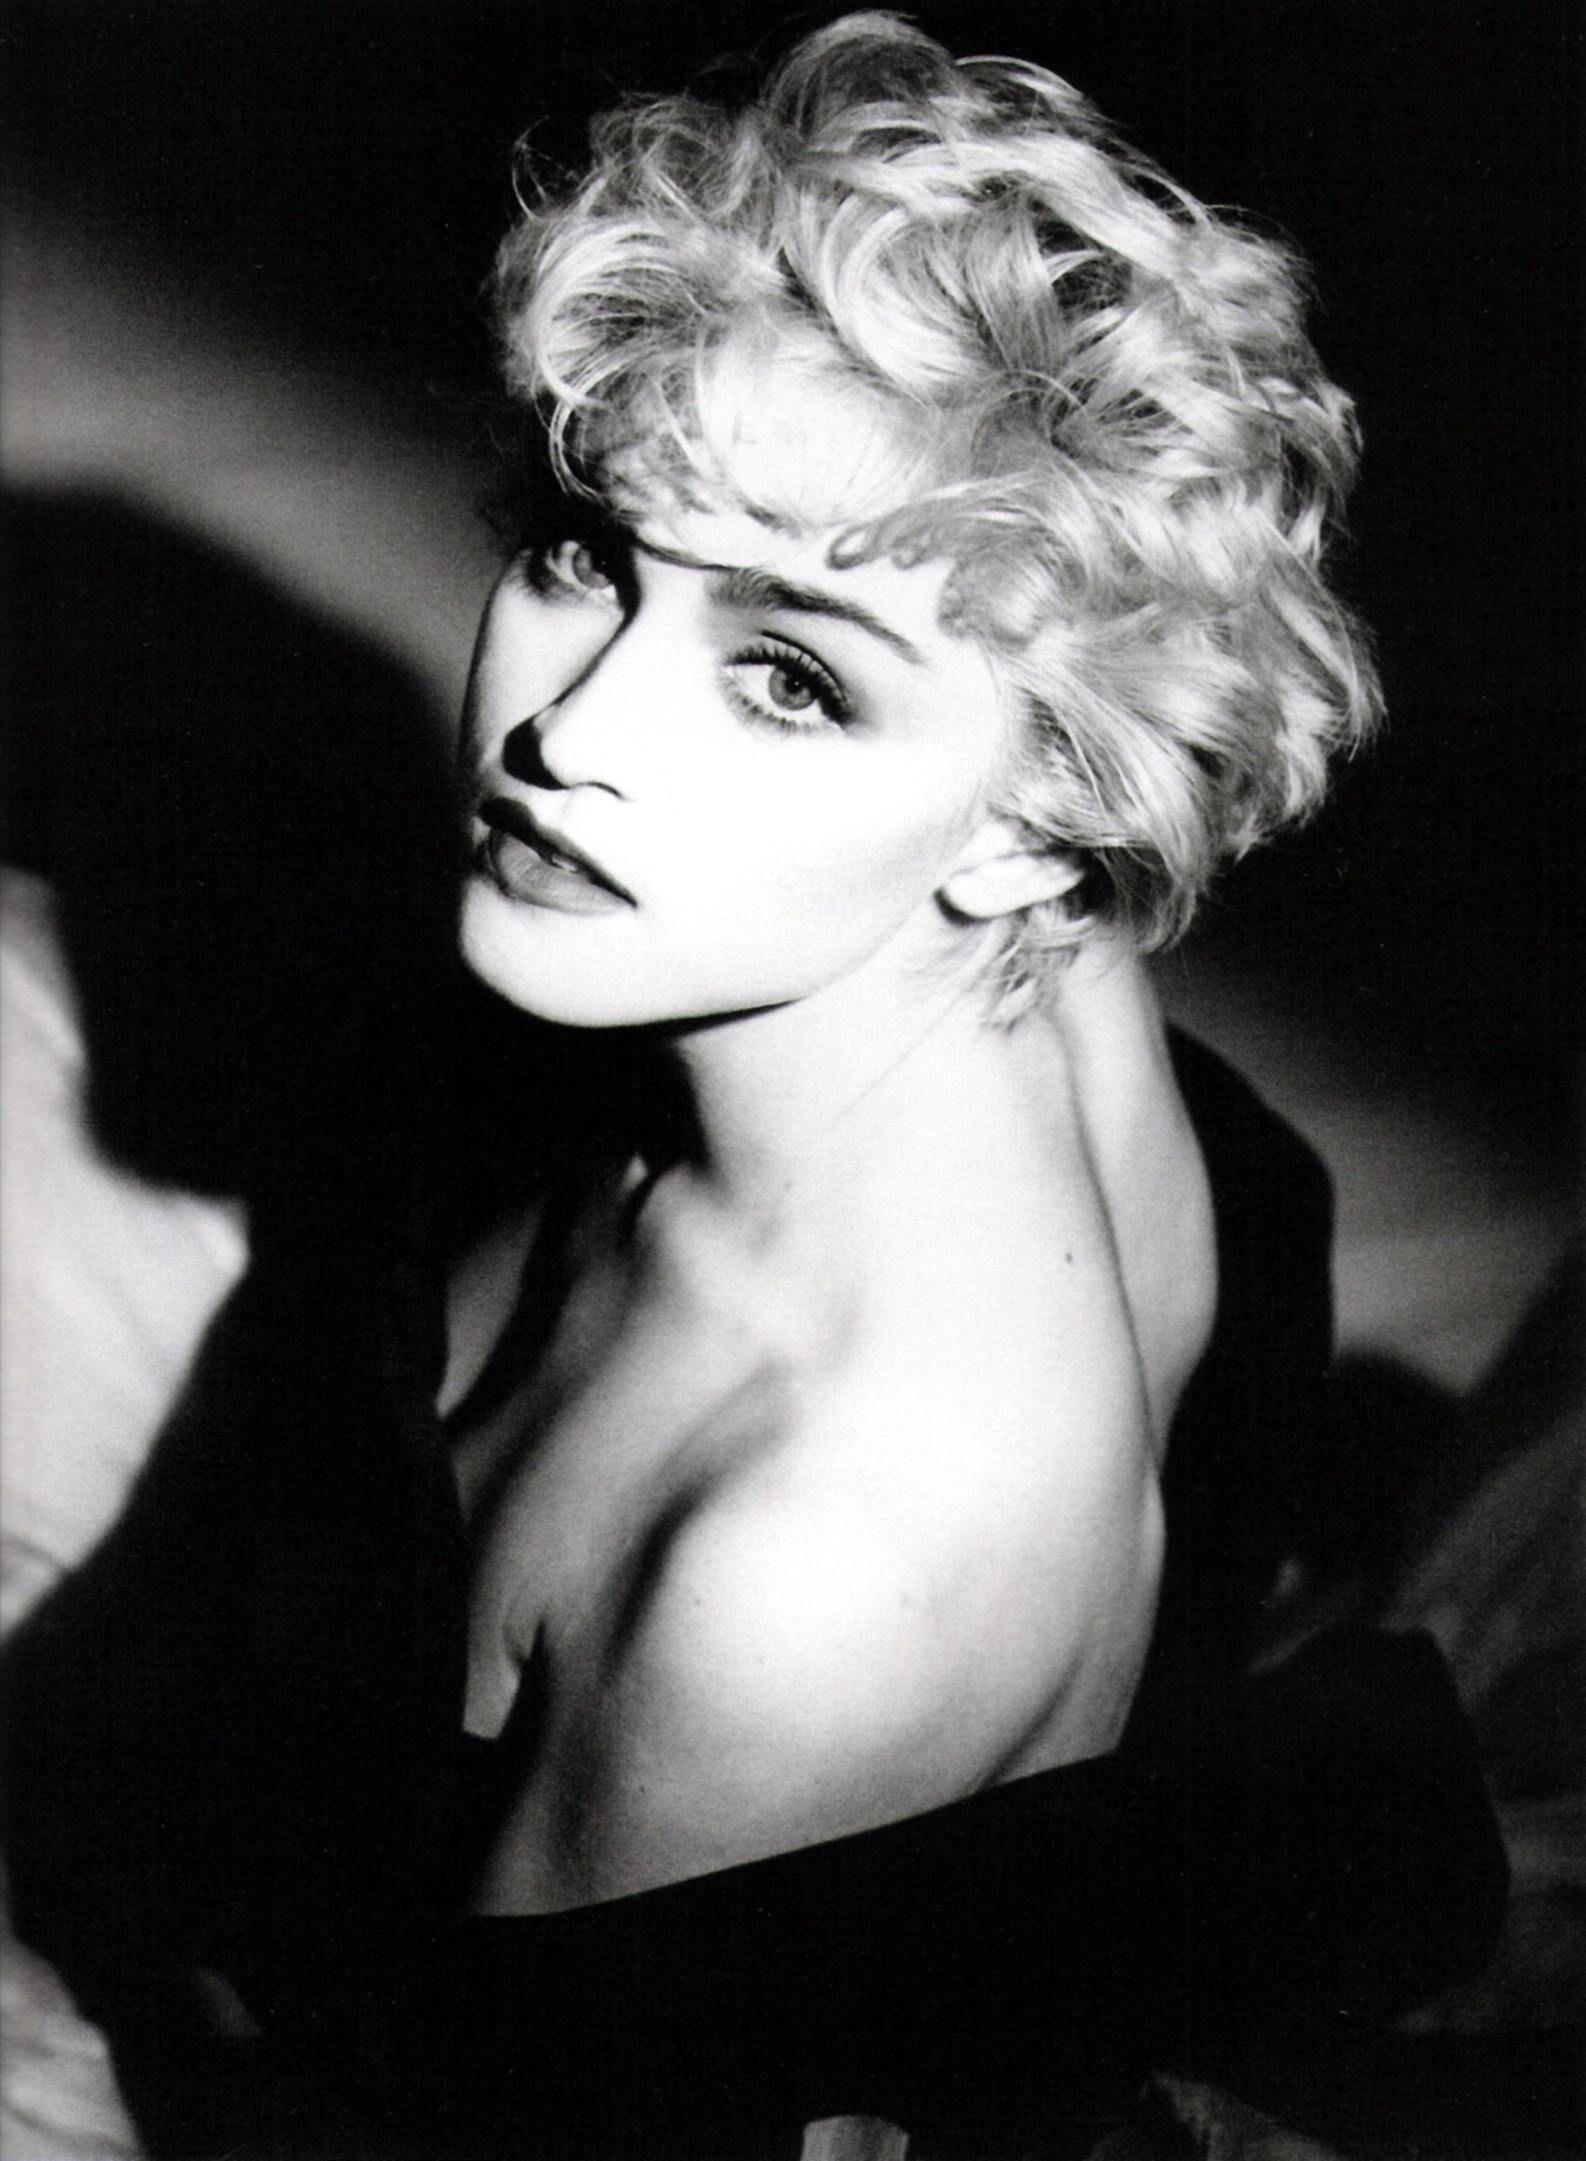 Madonna smoking on a cigarette I dislike smoking but it makes for